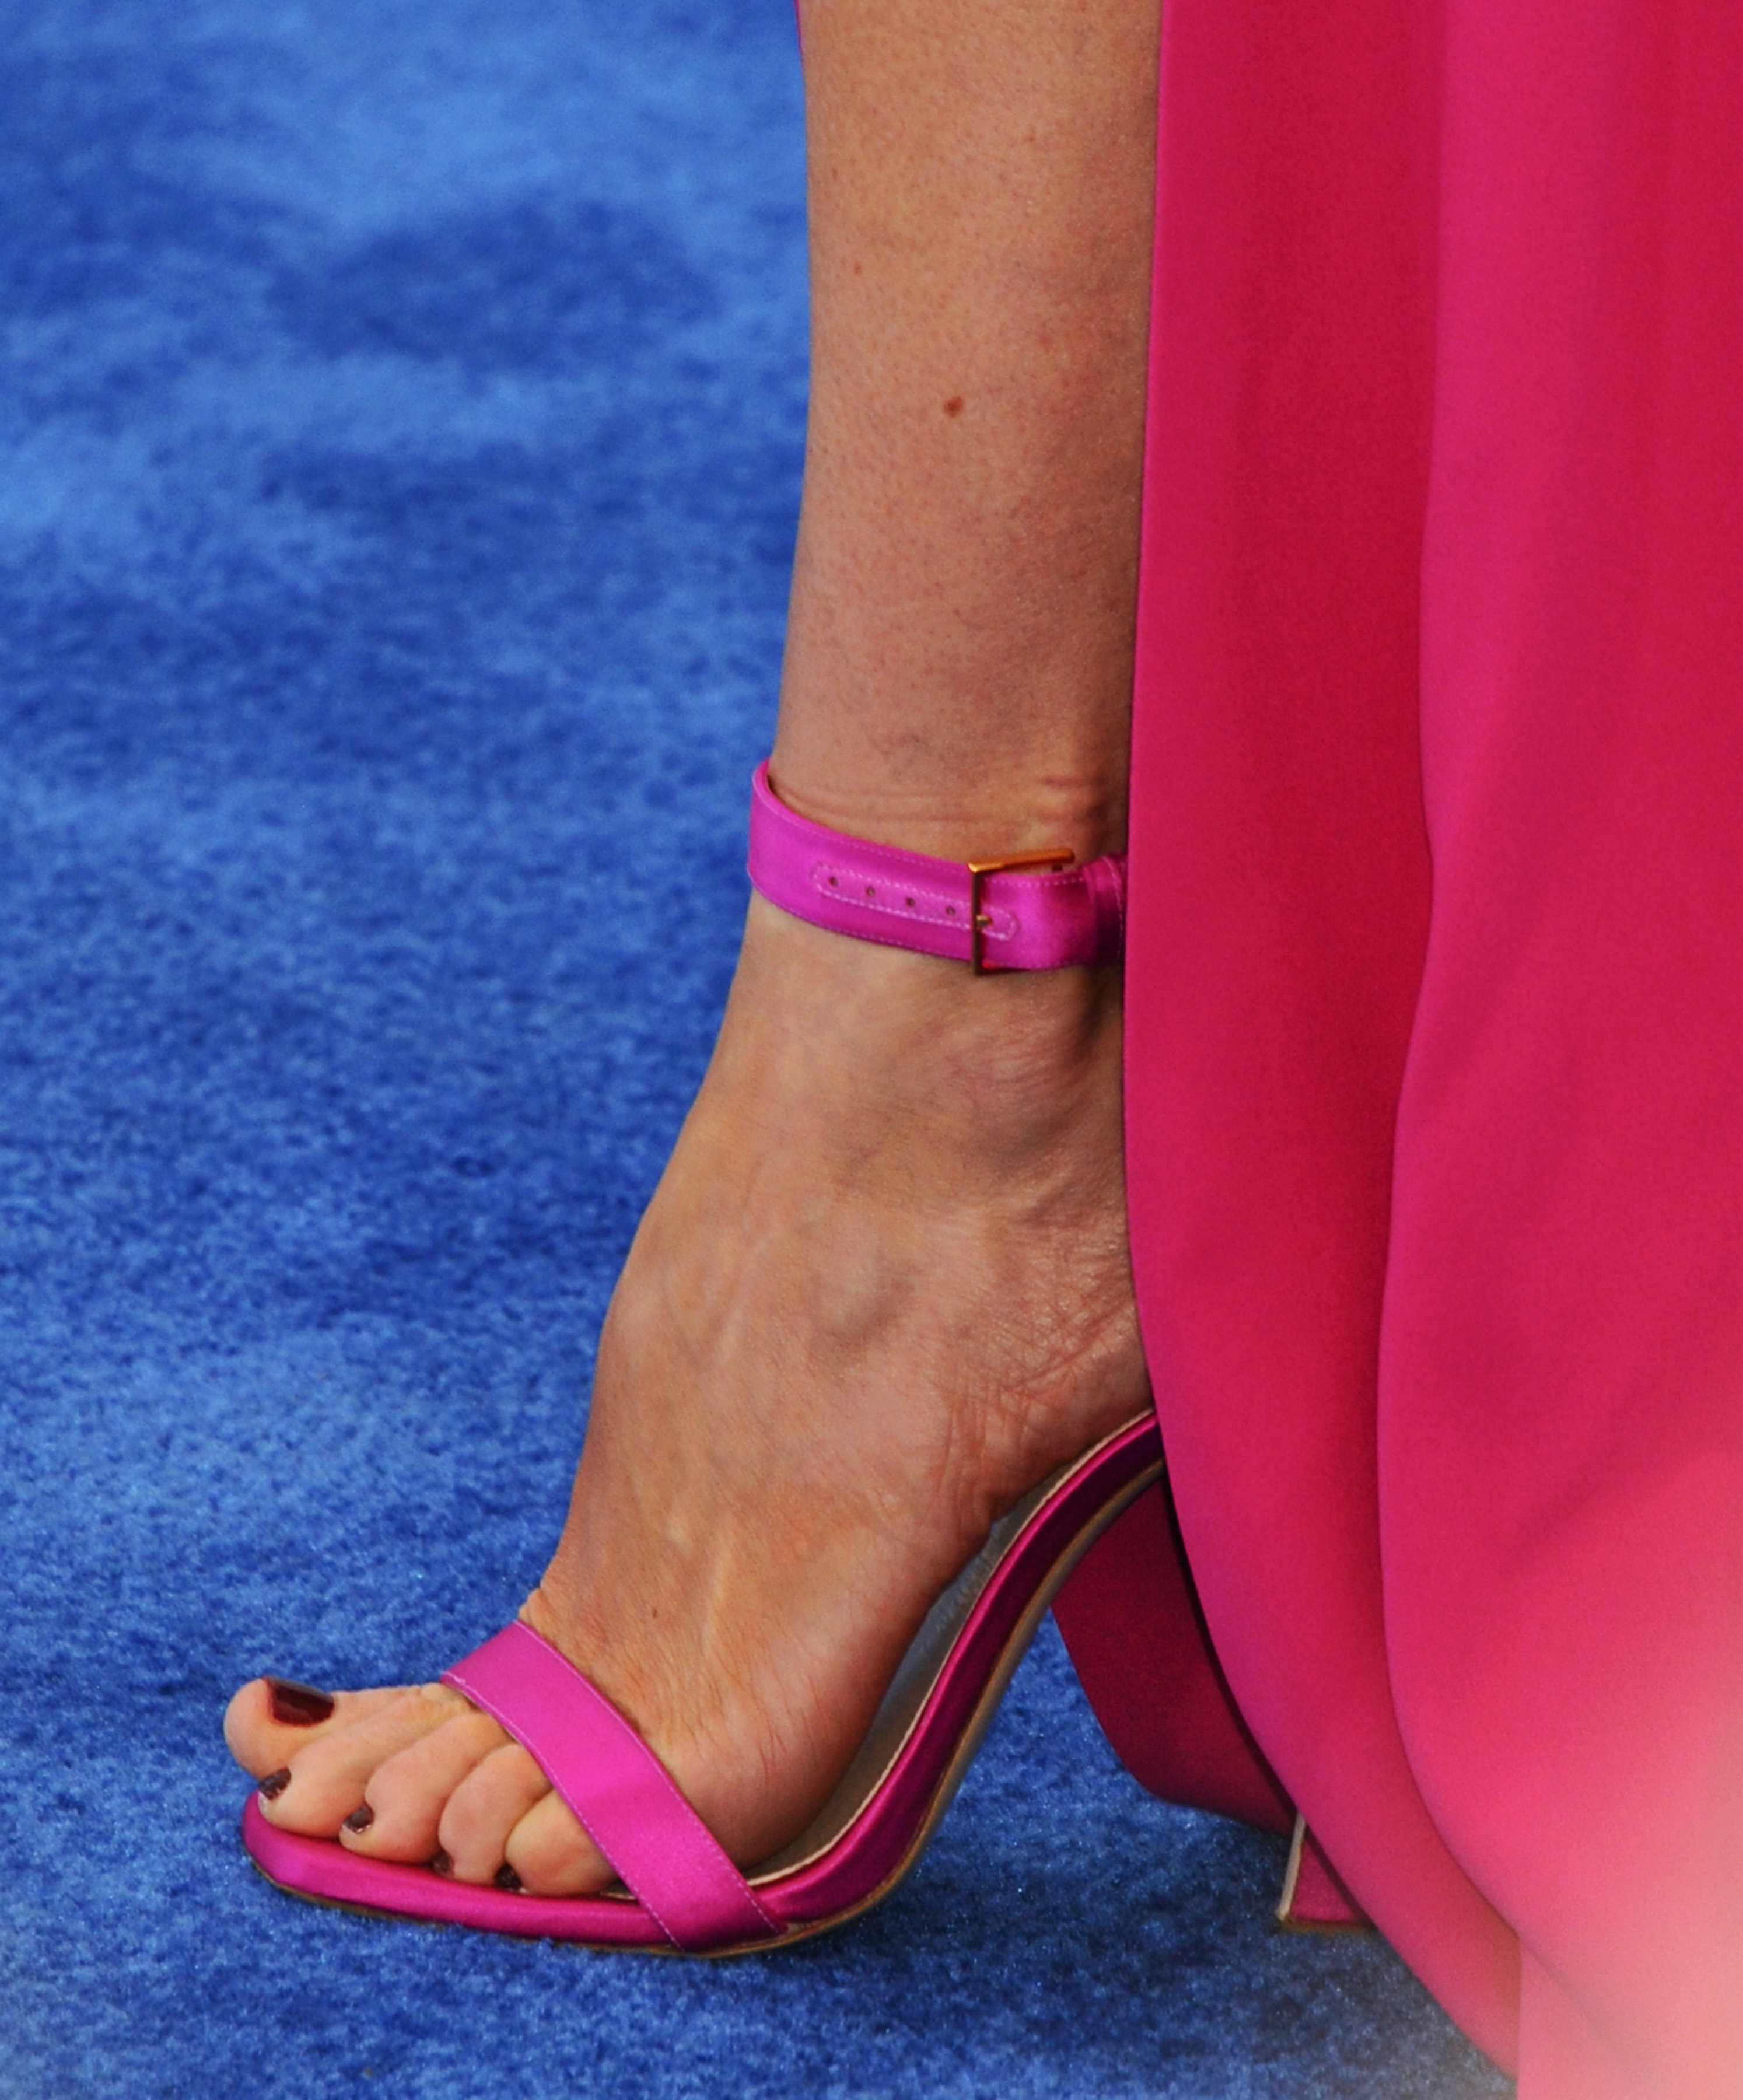 allison janney's feet << wikifeet